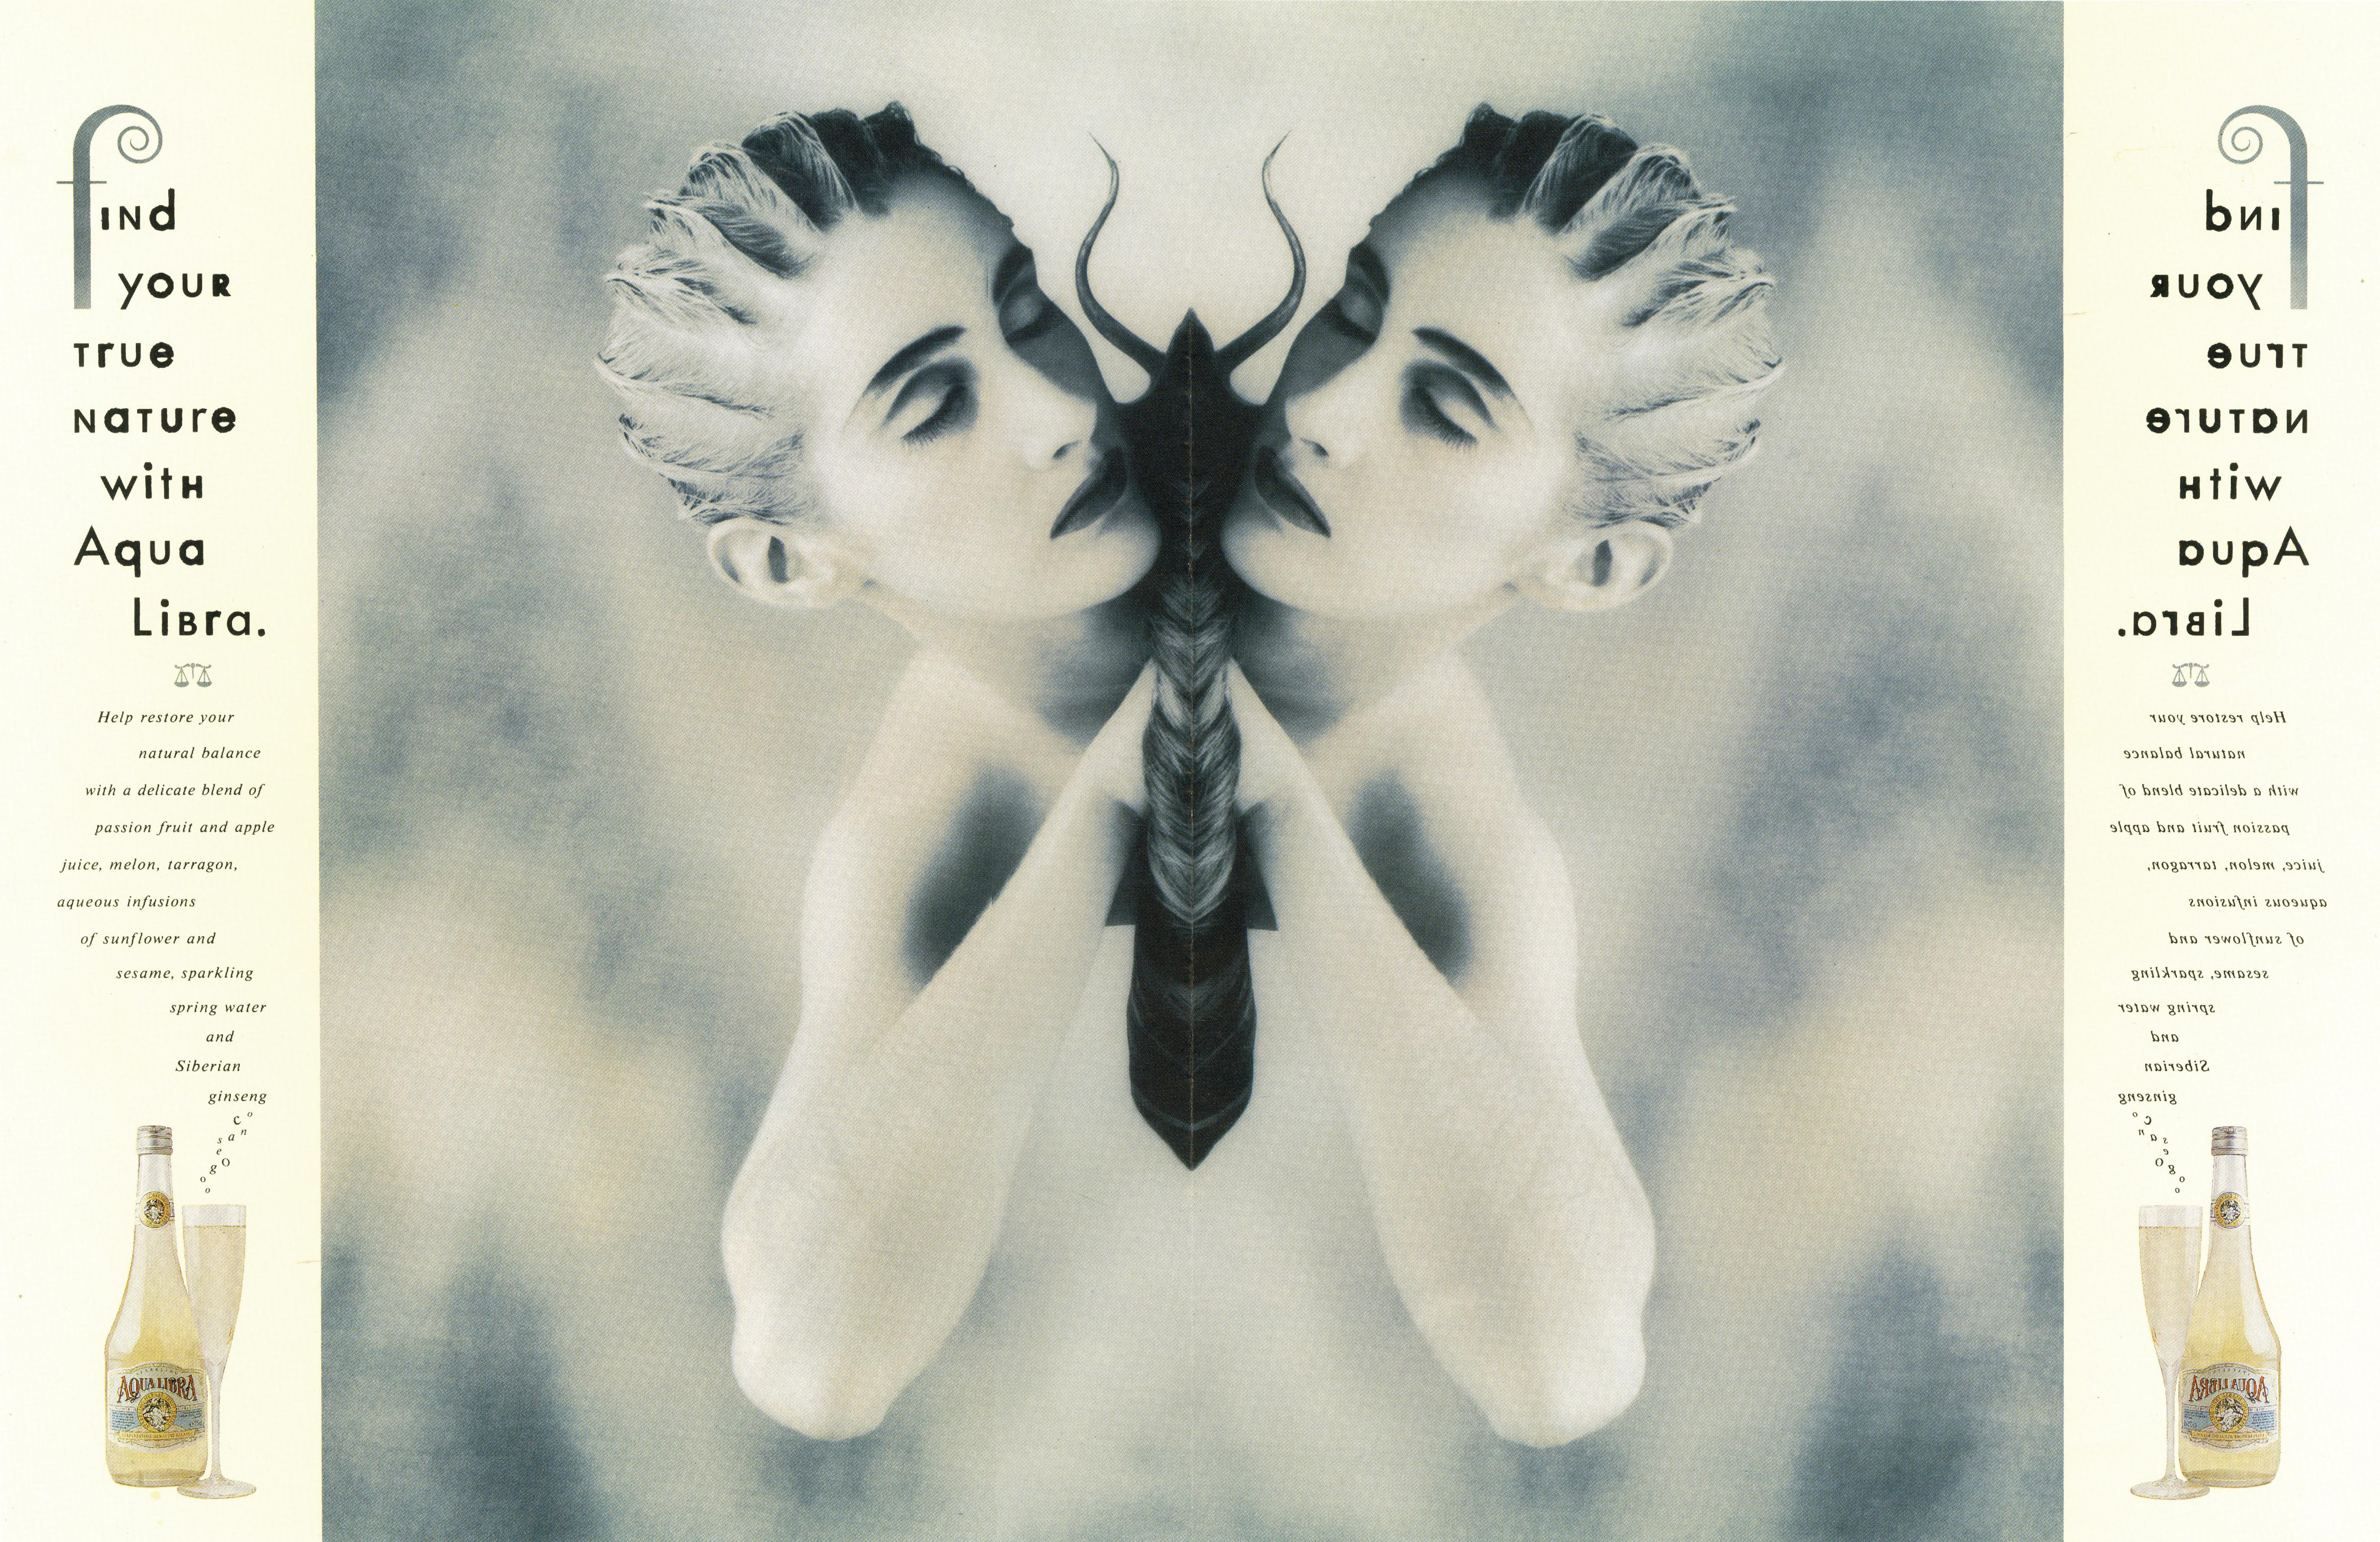 'Horns' Aqua Libra, Mark Reddy, Ayer-01.jpg